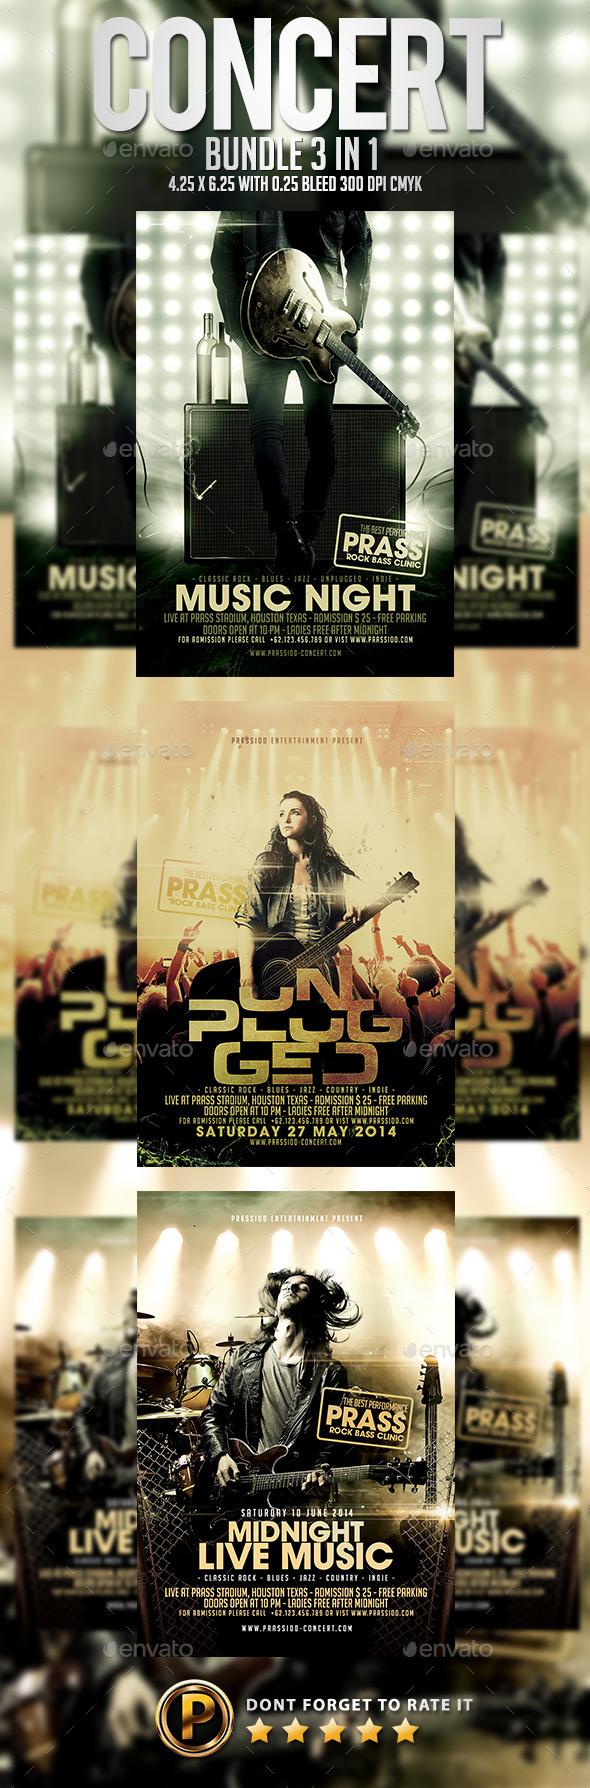 Concert Flyer Template - Bundle 3 in 1 - Concerts Events